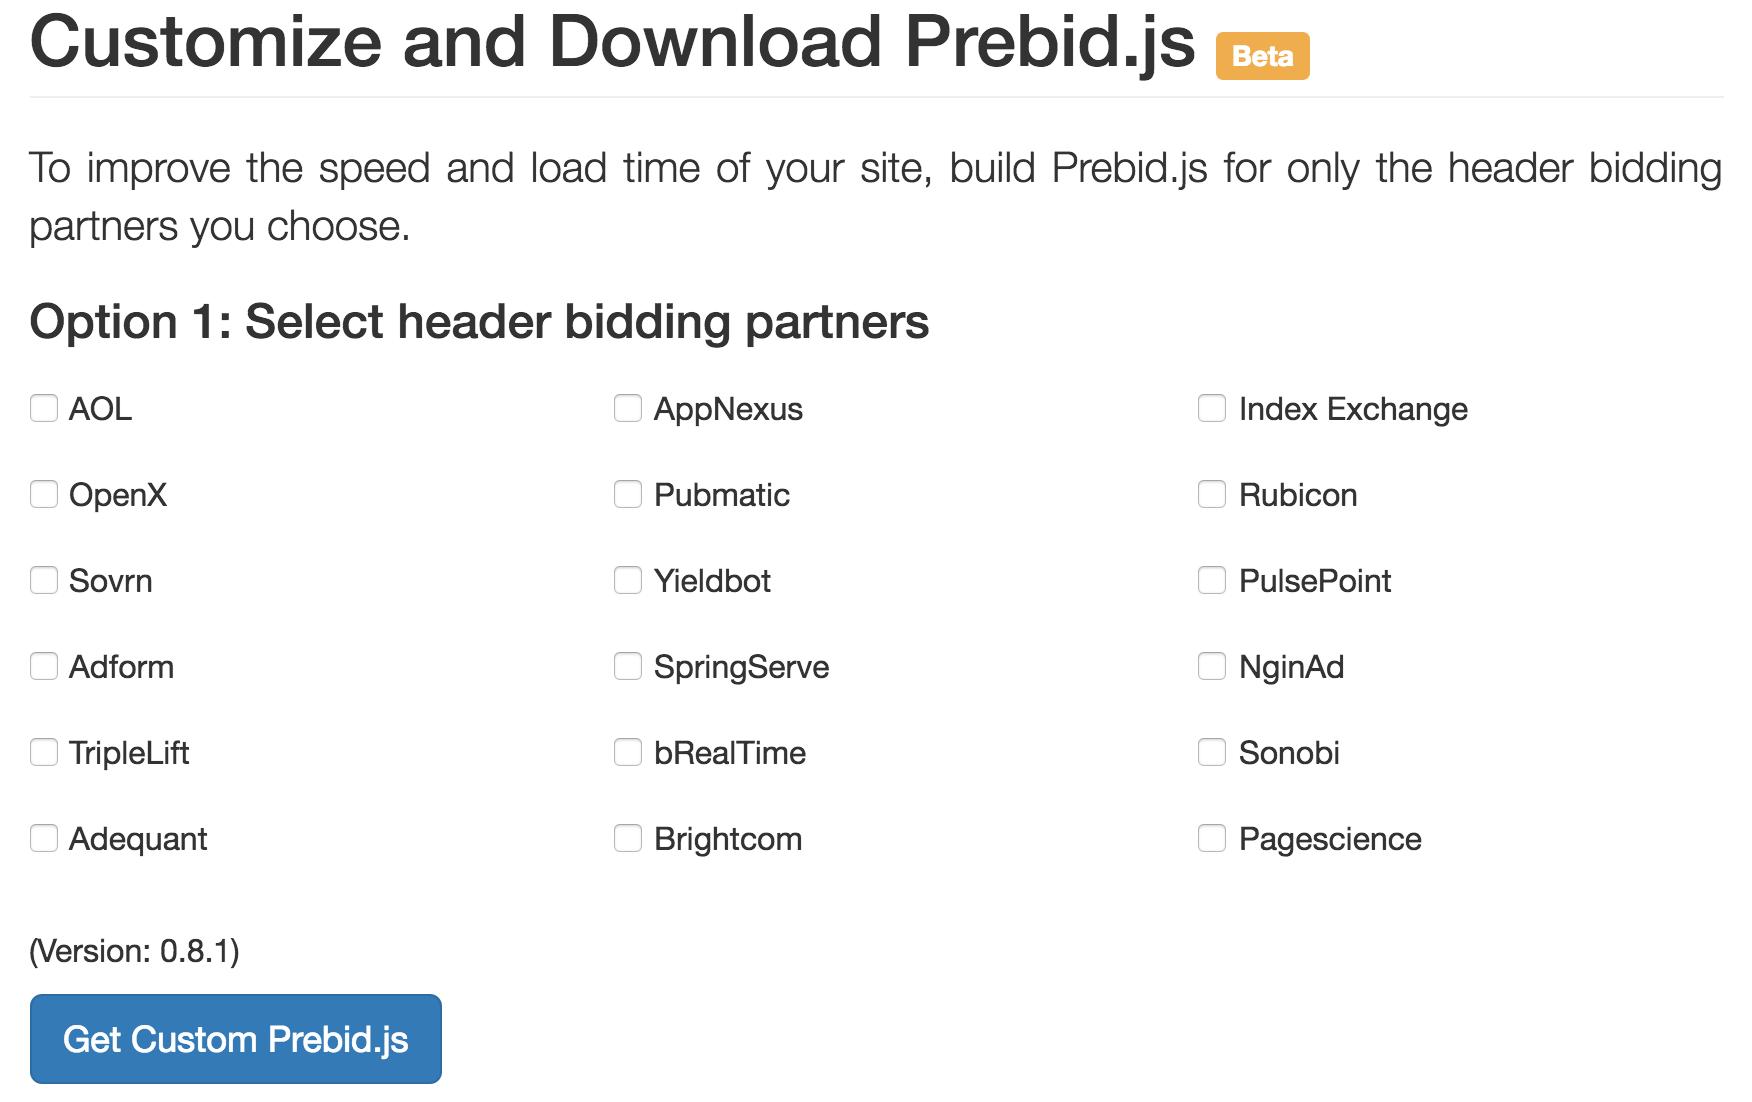 Prebid.js Customize Download UI